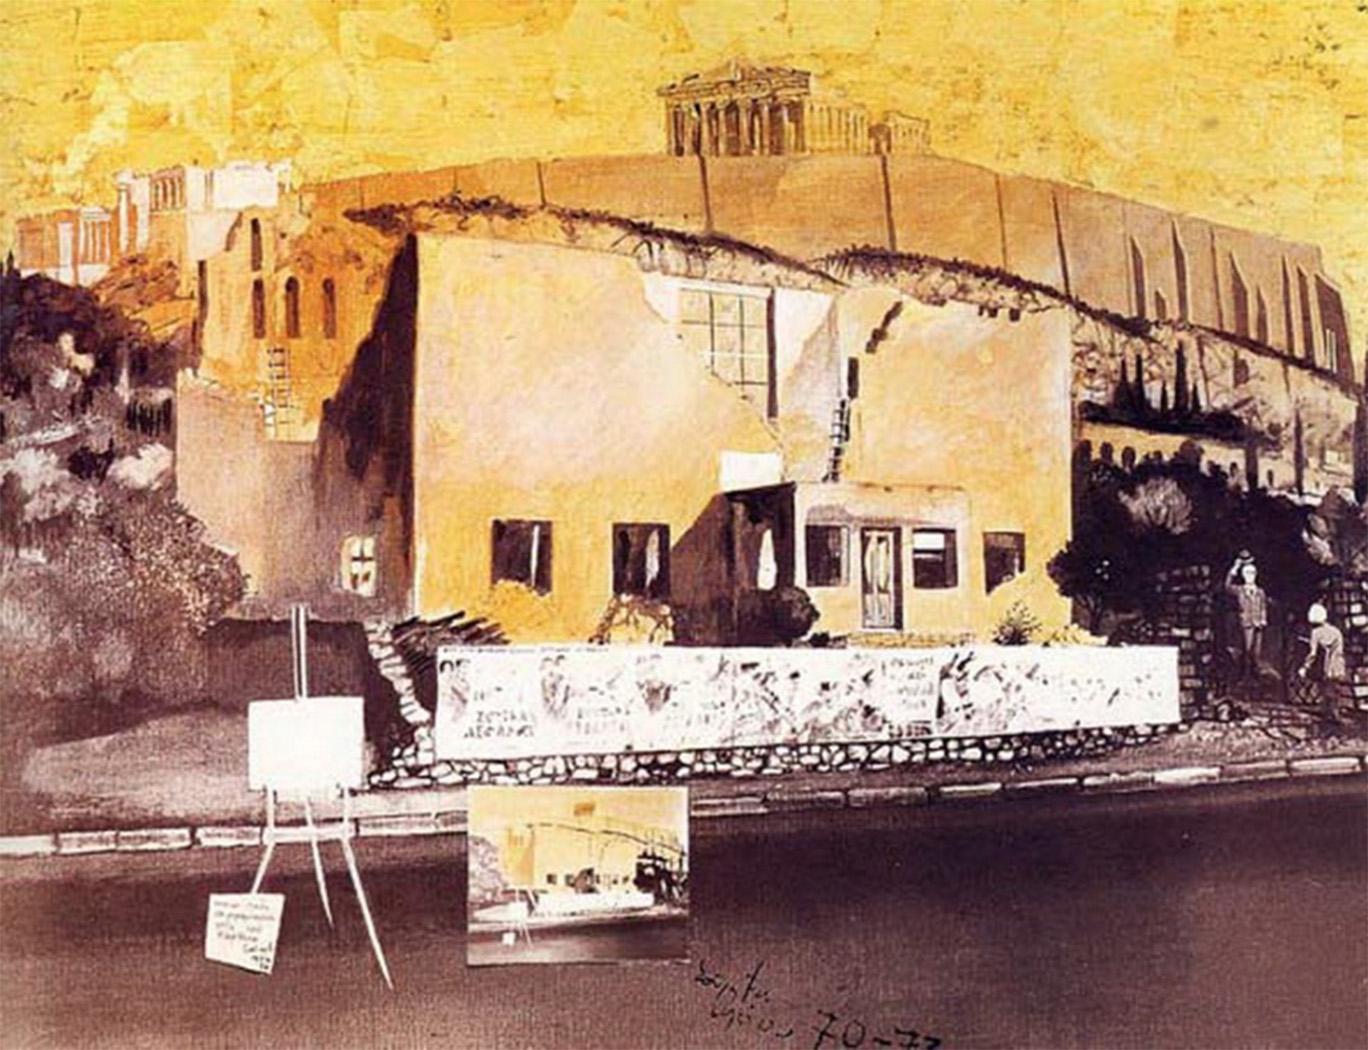 Parthenis house, painting by Spyros Vassiliou, his neighbor